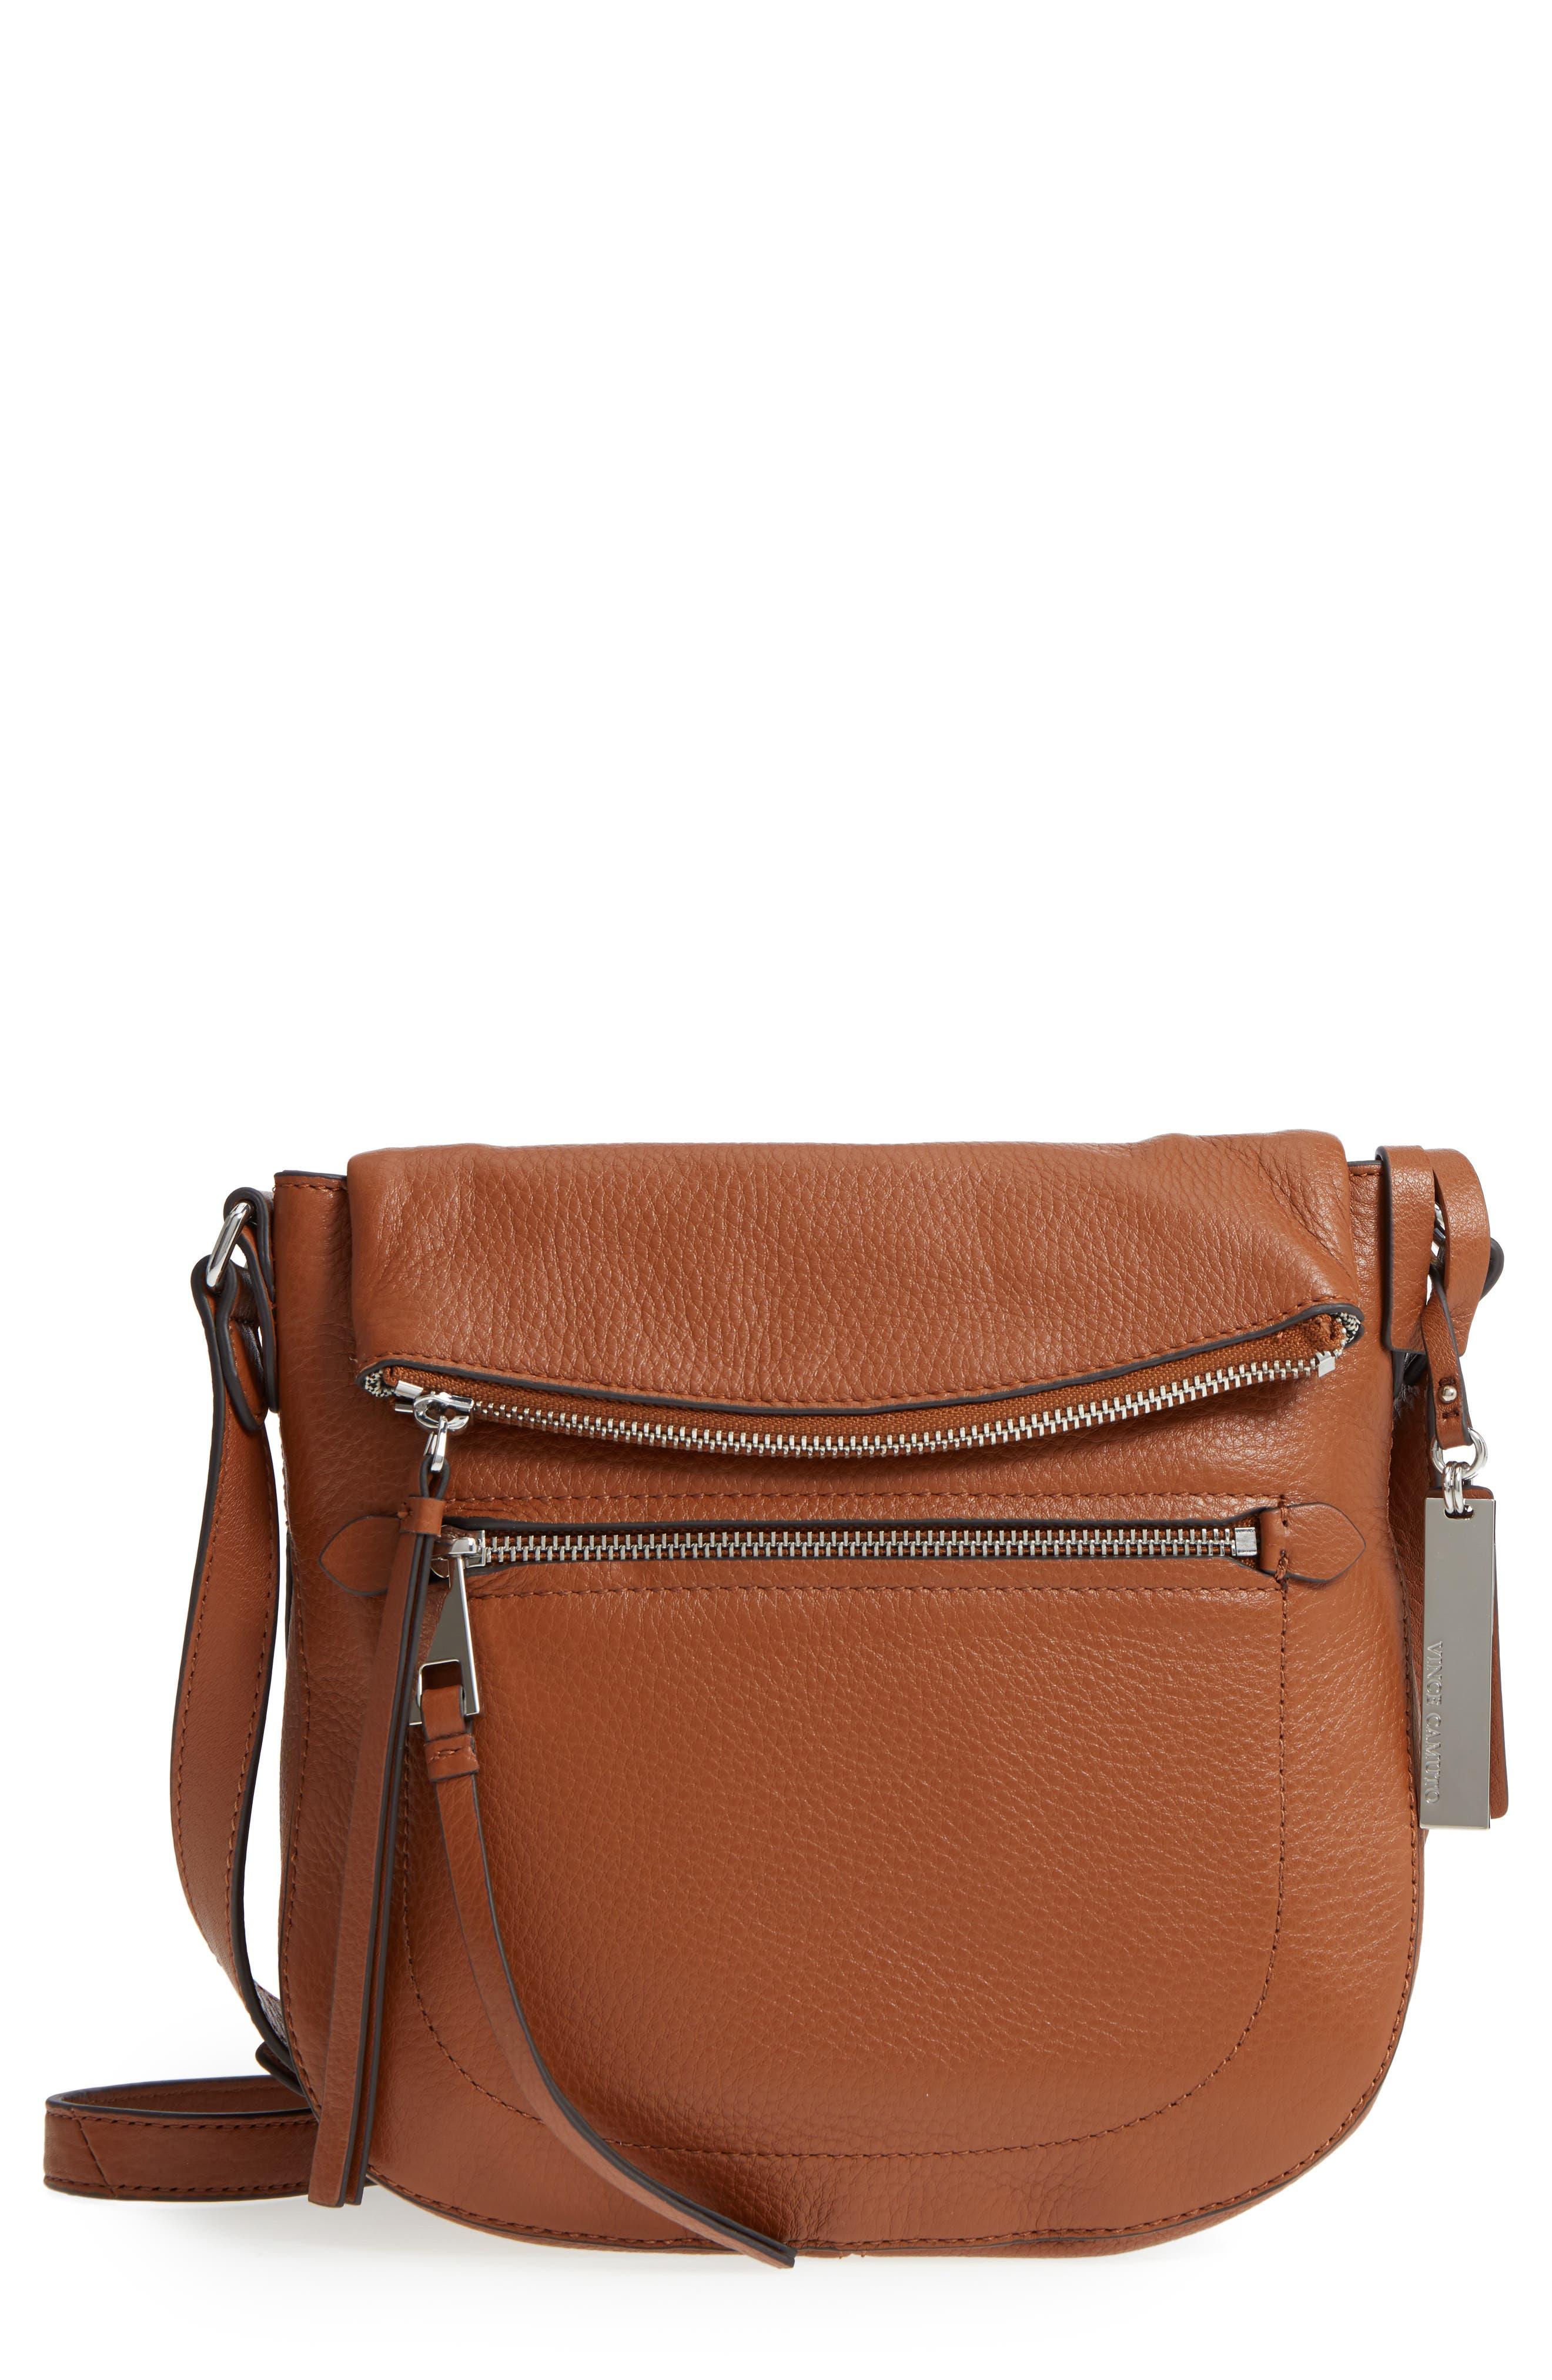 'Tala' Leather Crossbody Bag,                             Main thumbnail 1, color,                             Dark Rum